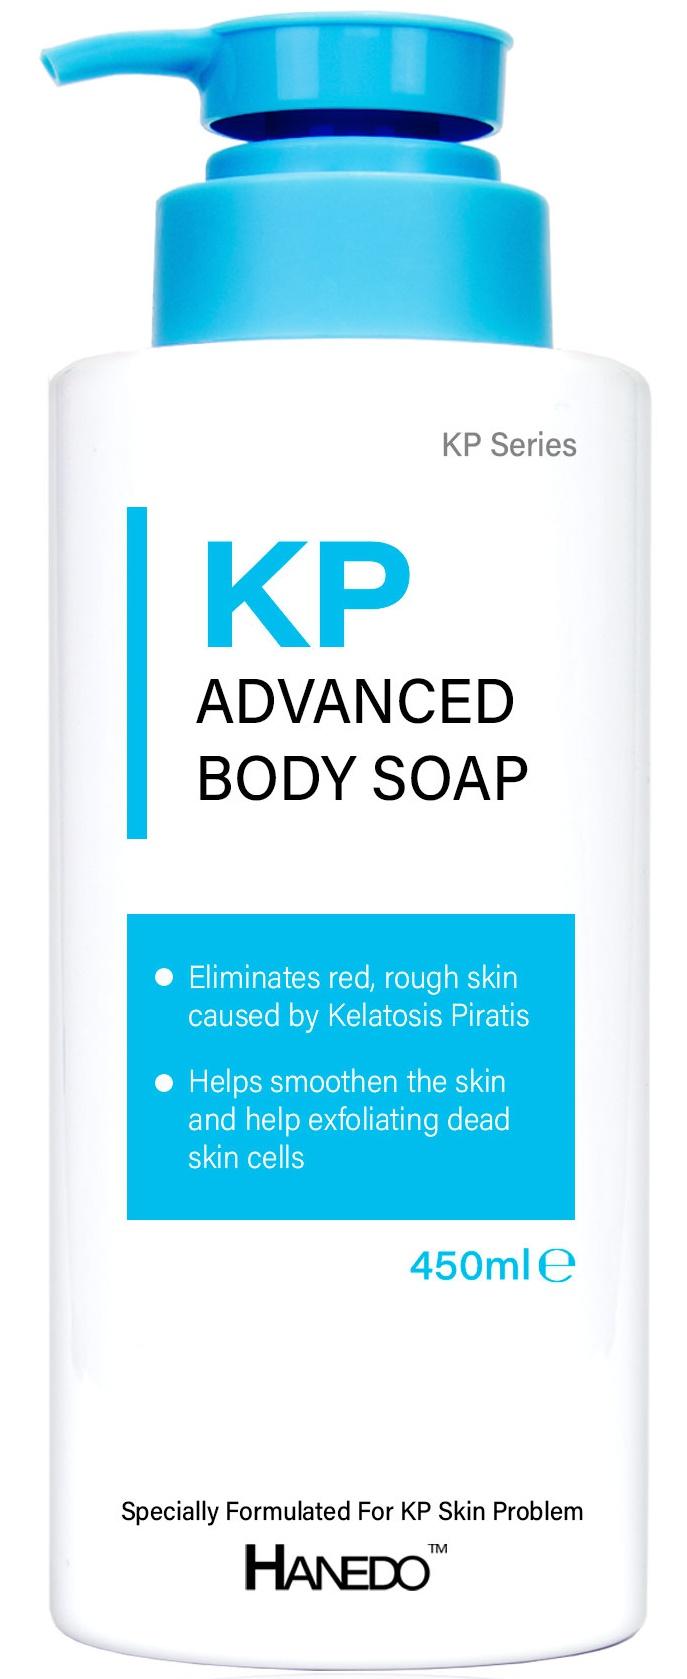 Hanedo KP Advanced Body Soap